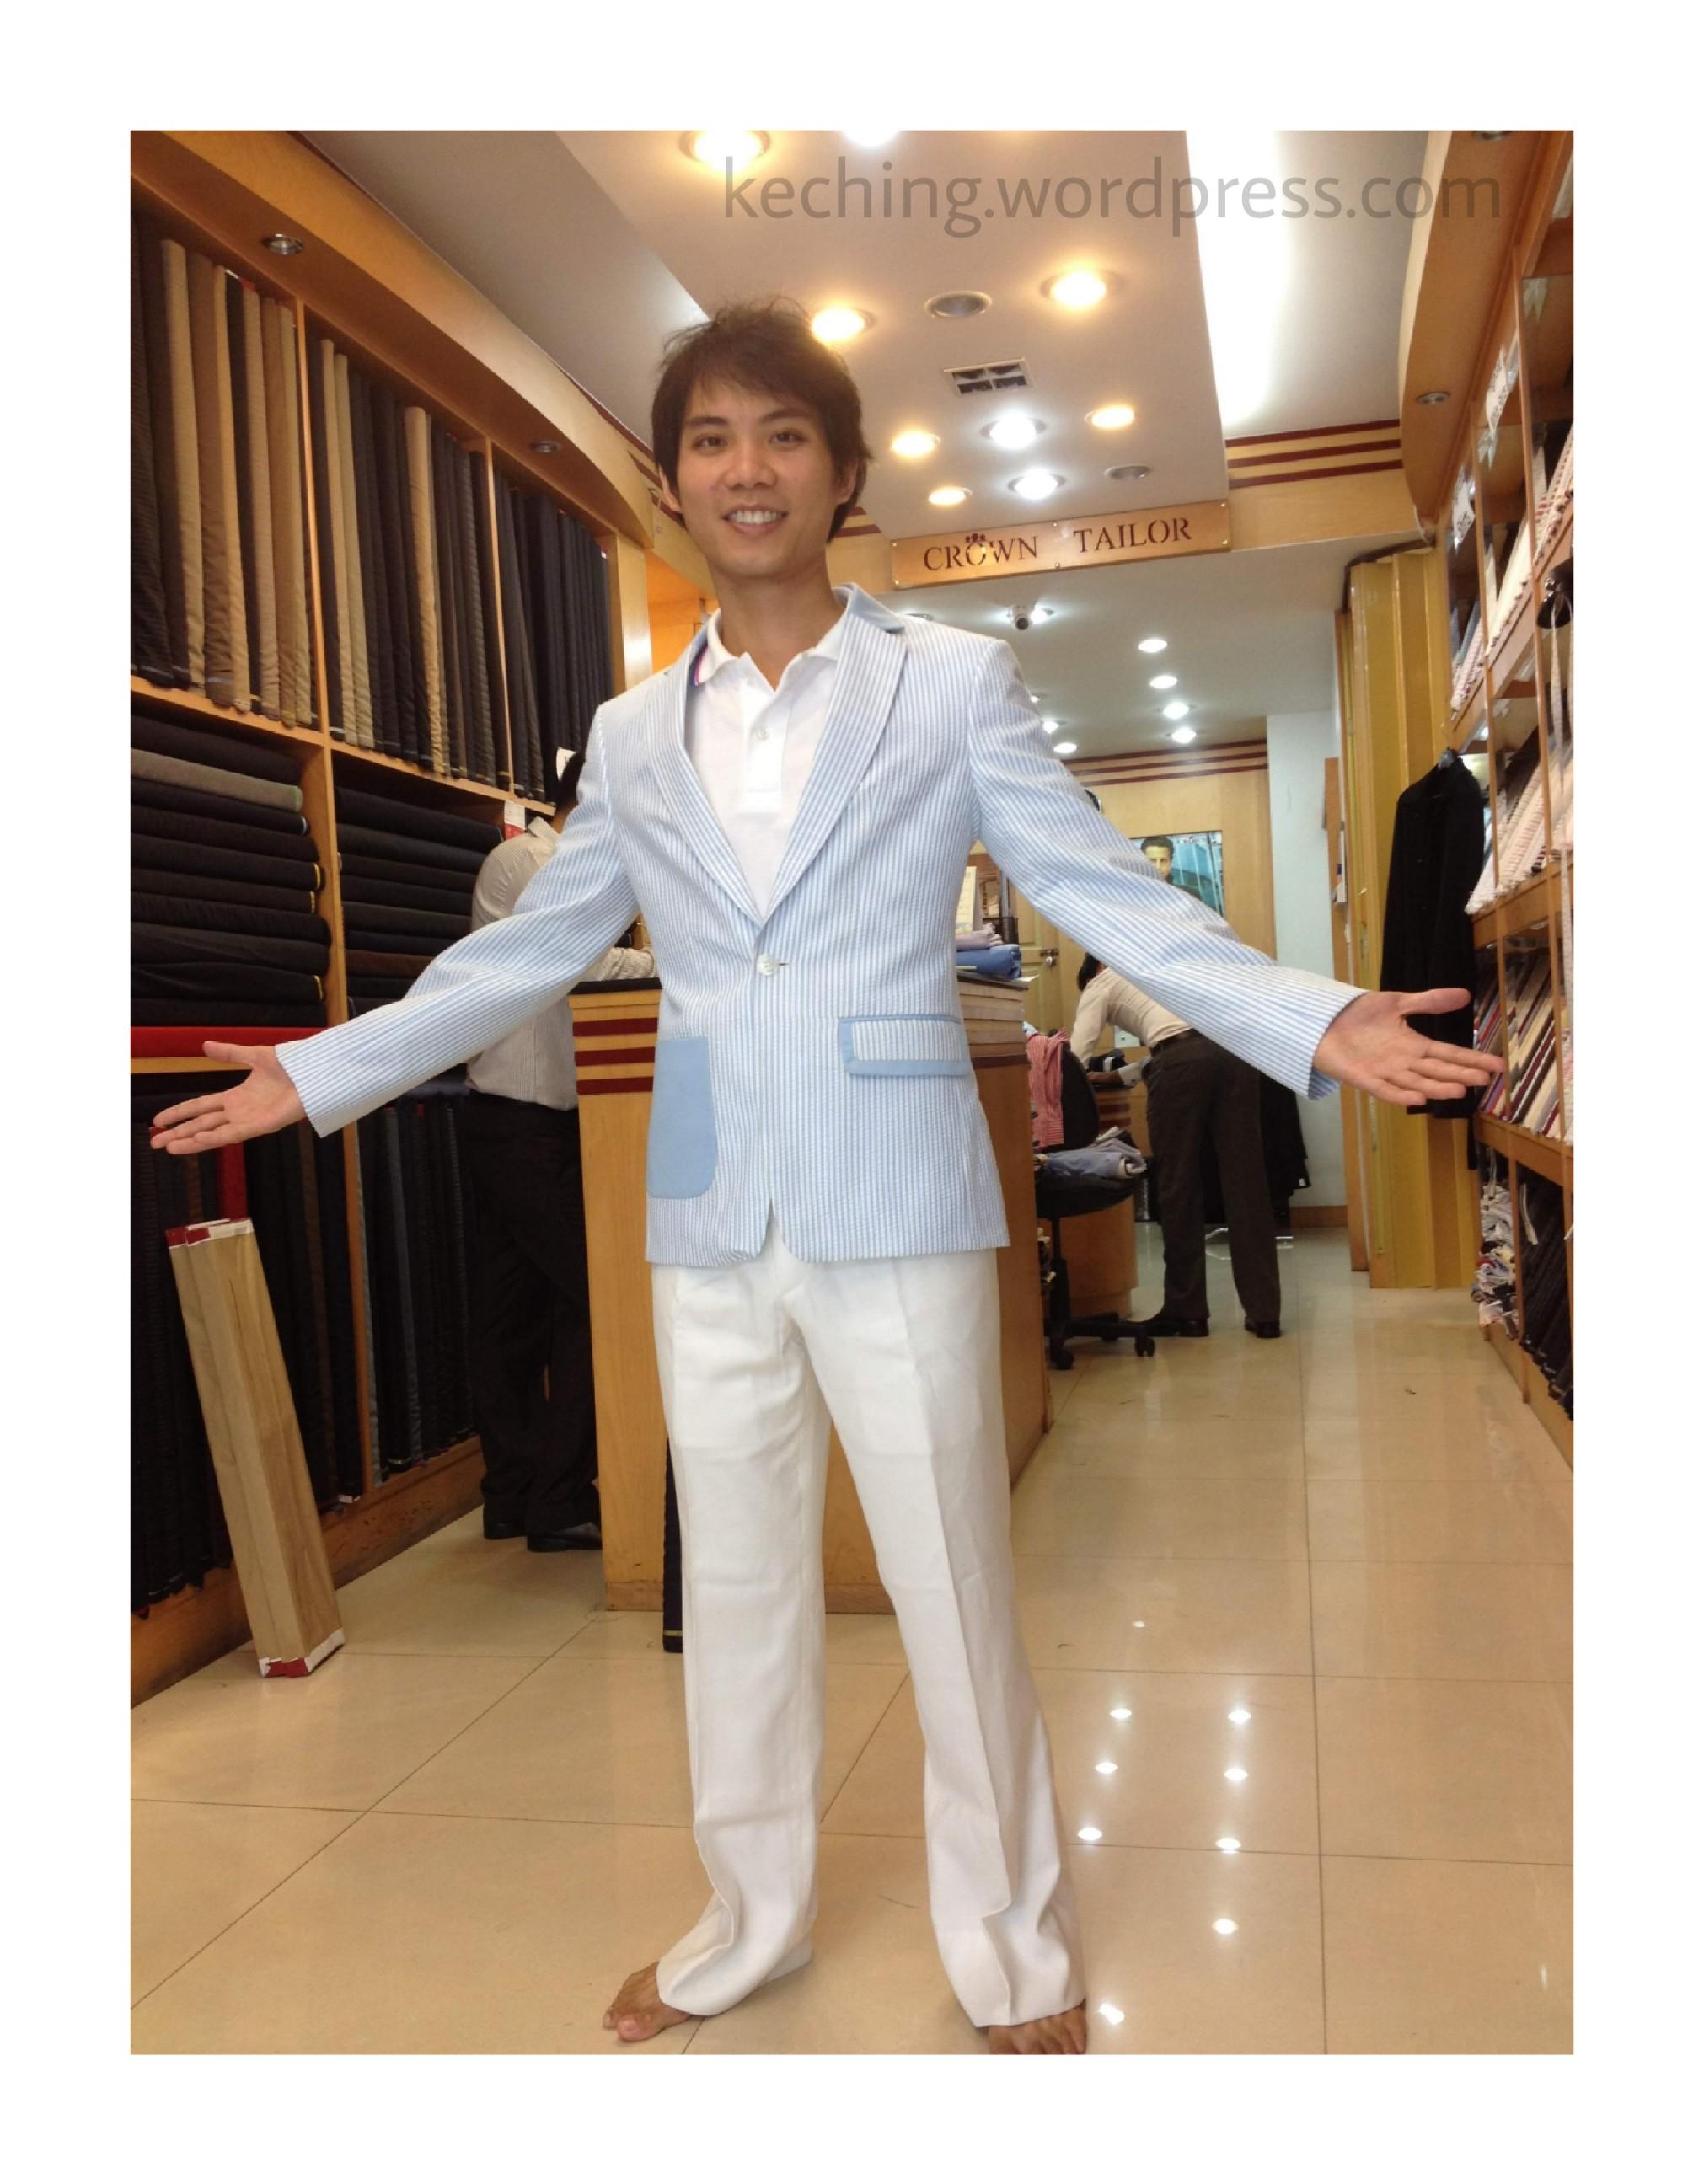 crown tailor bangkok review